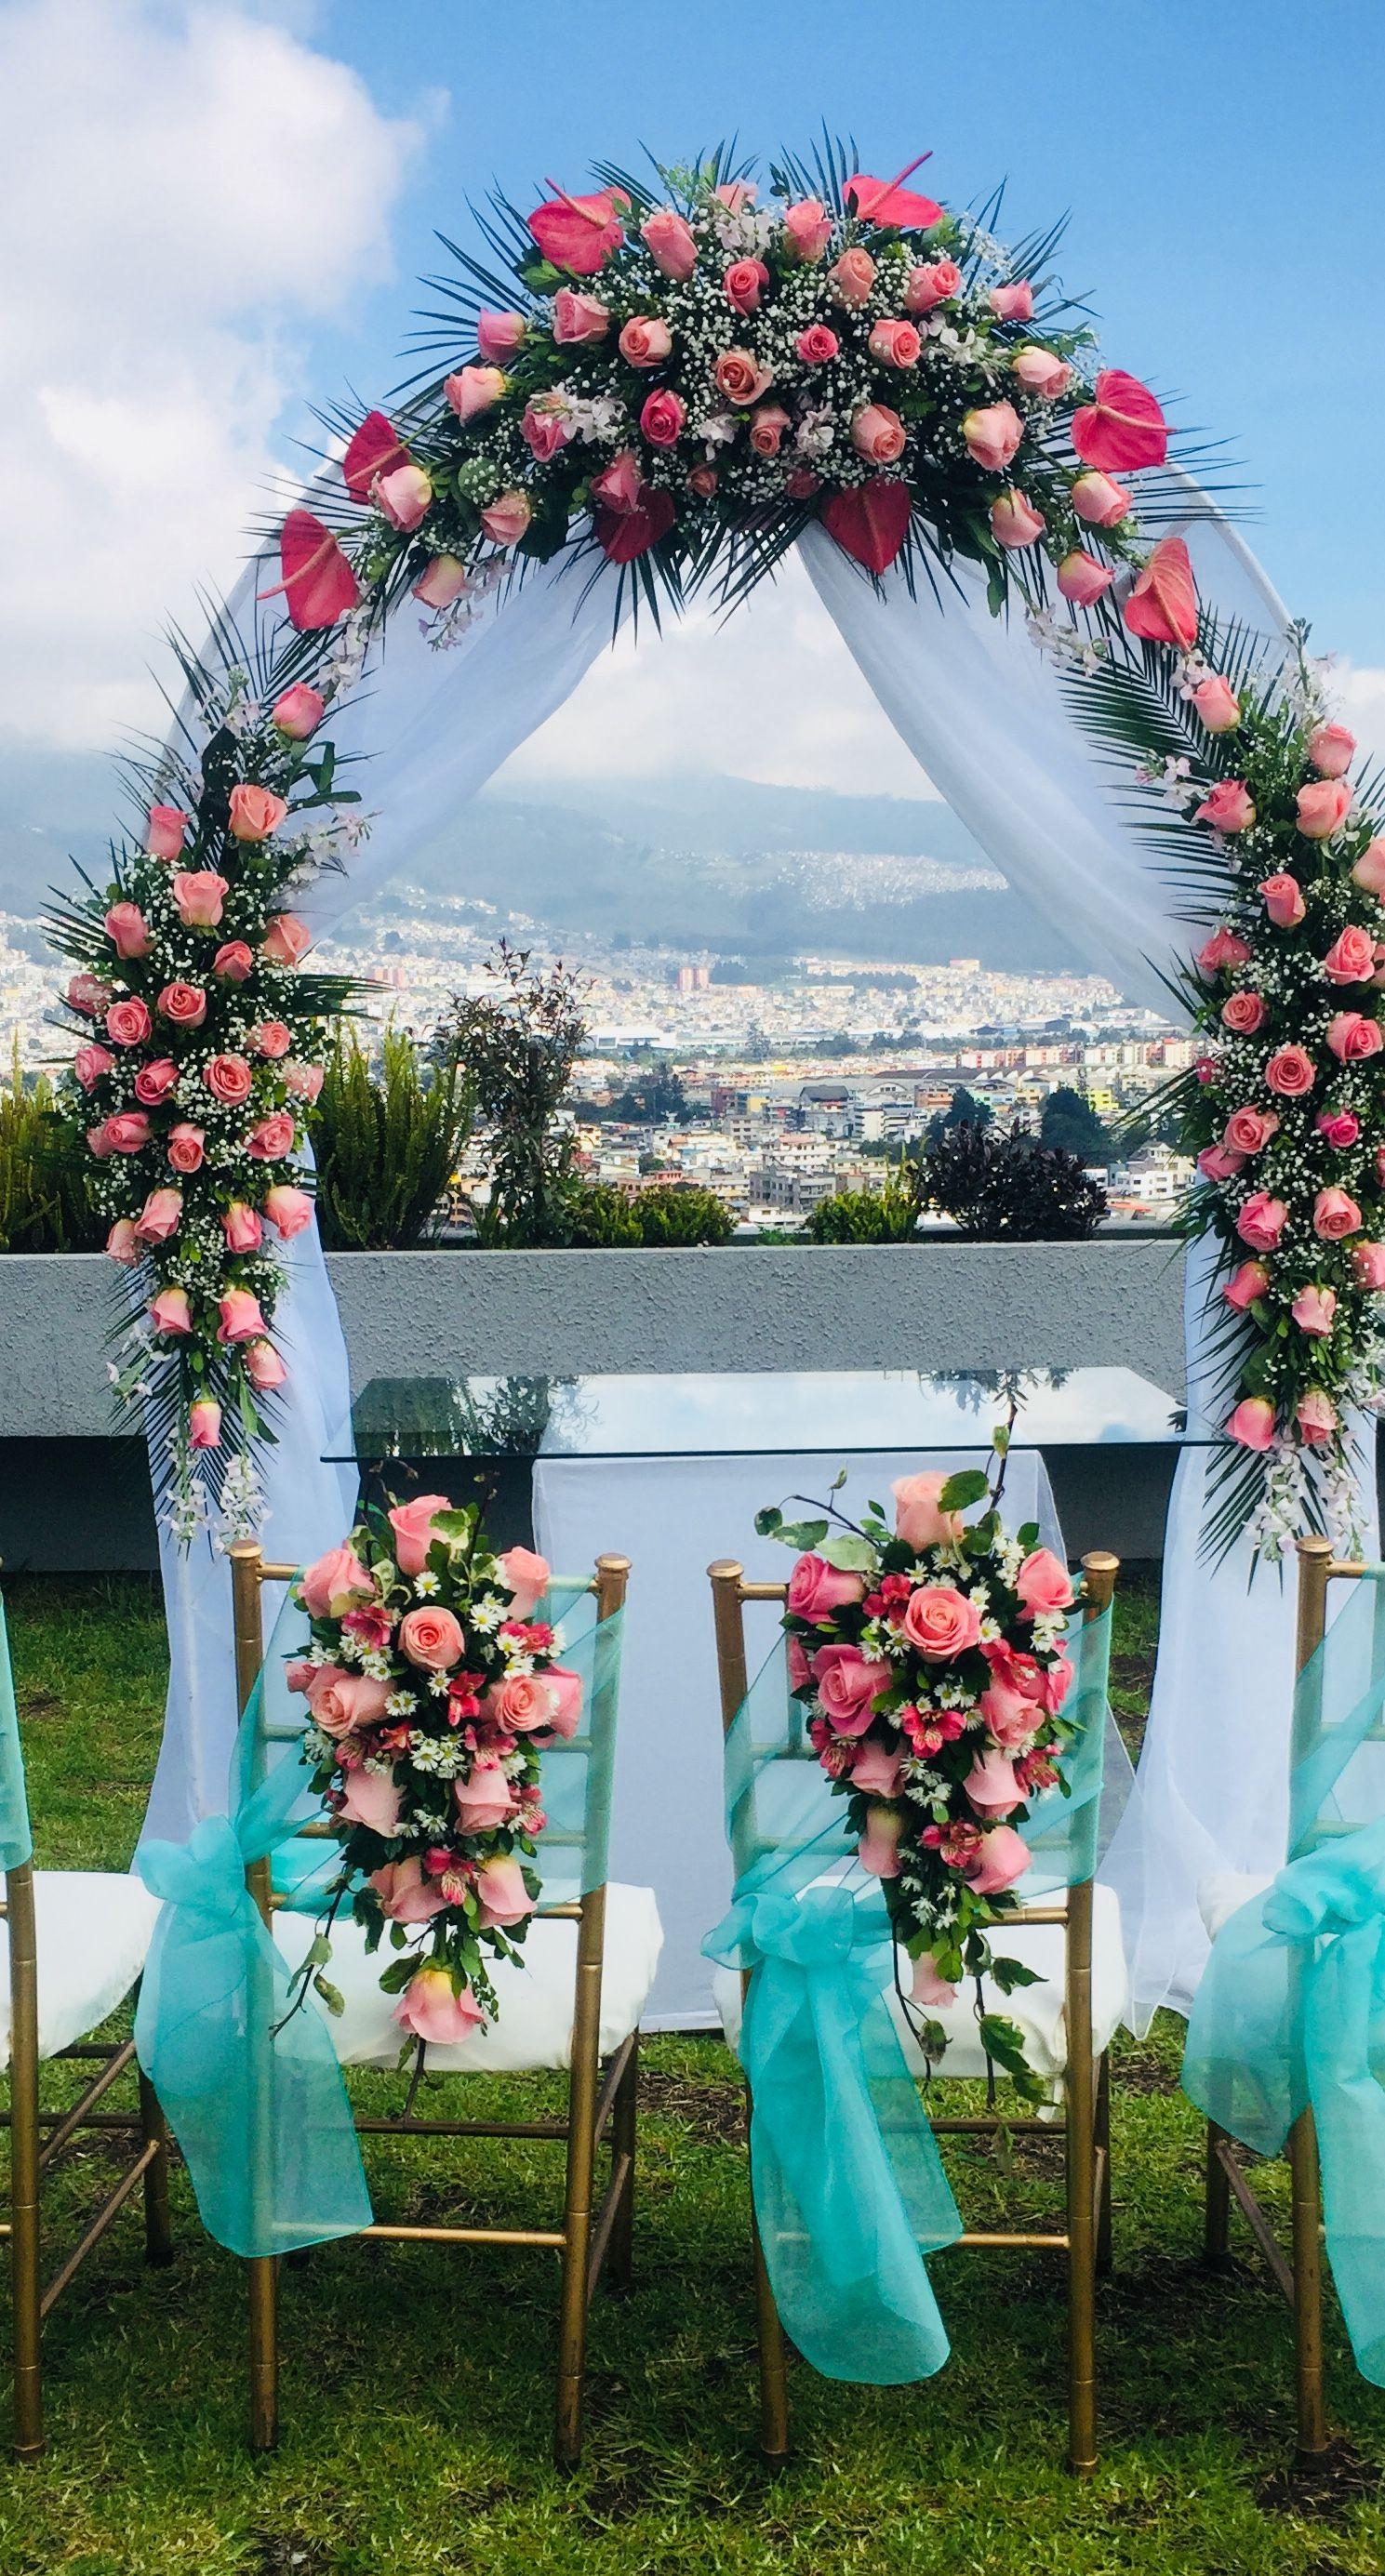 Arco Para Ceremonia Decoracion Bodas Sillas Decoradas Boda Elegante